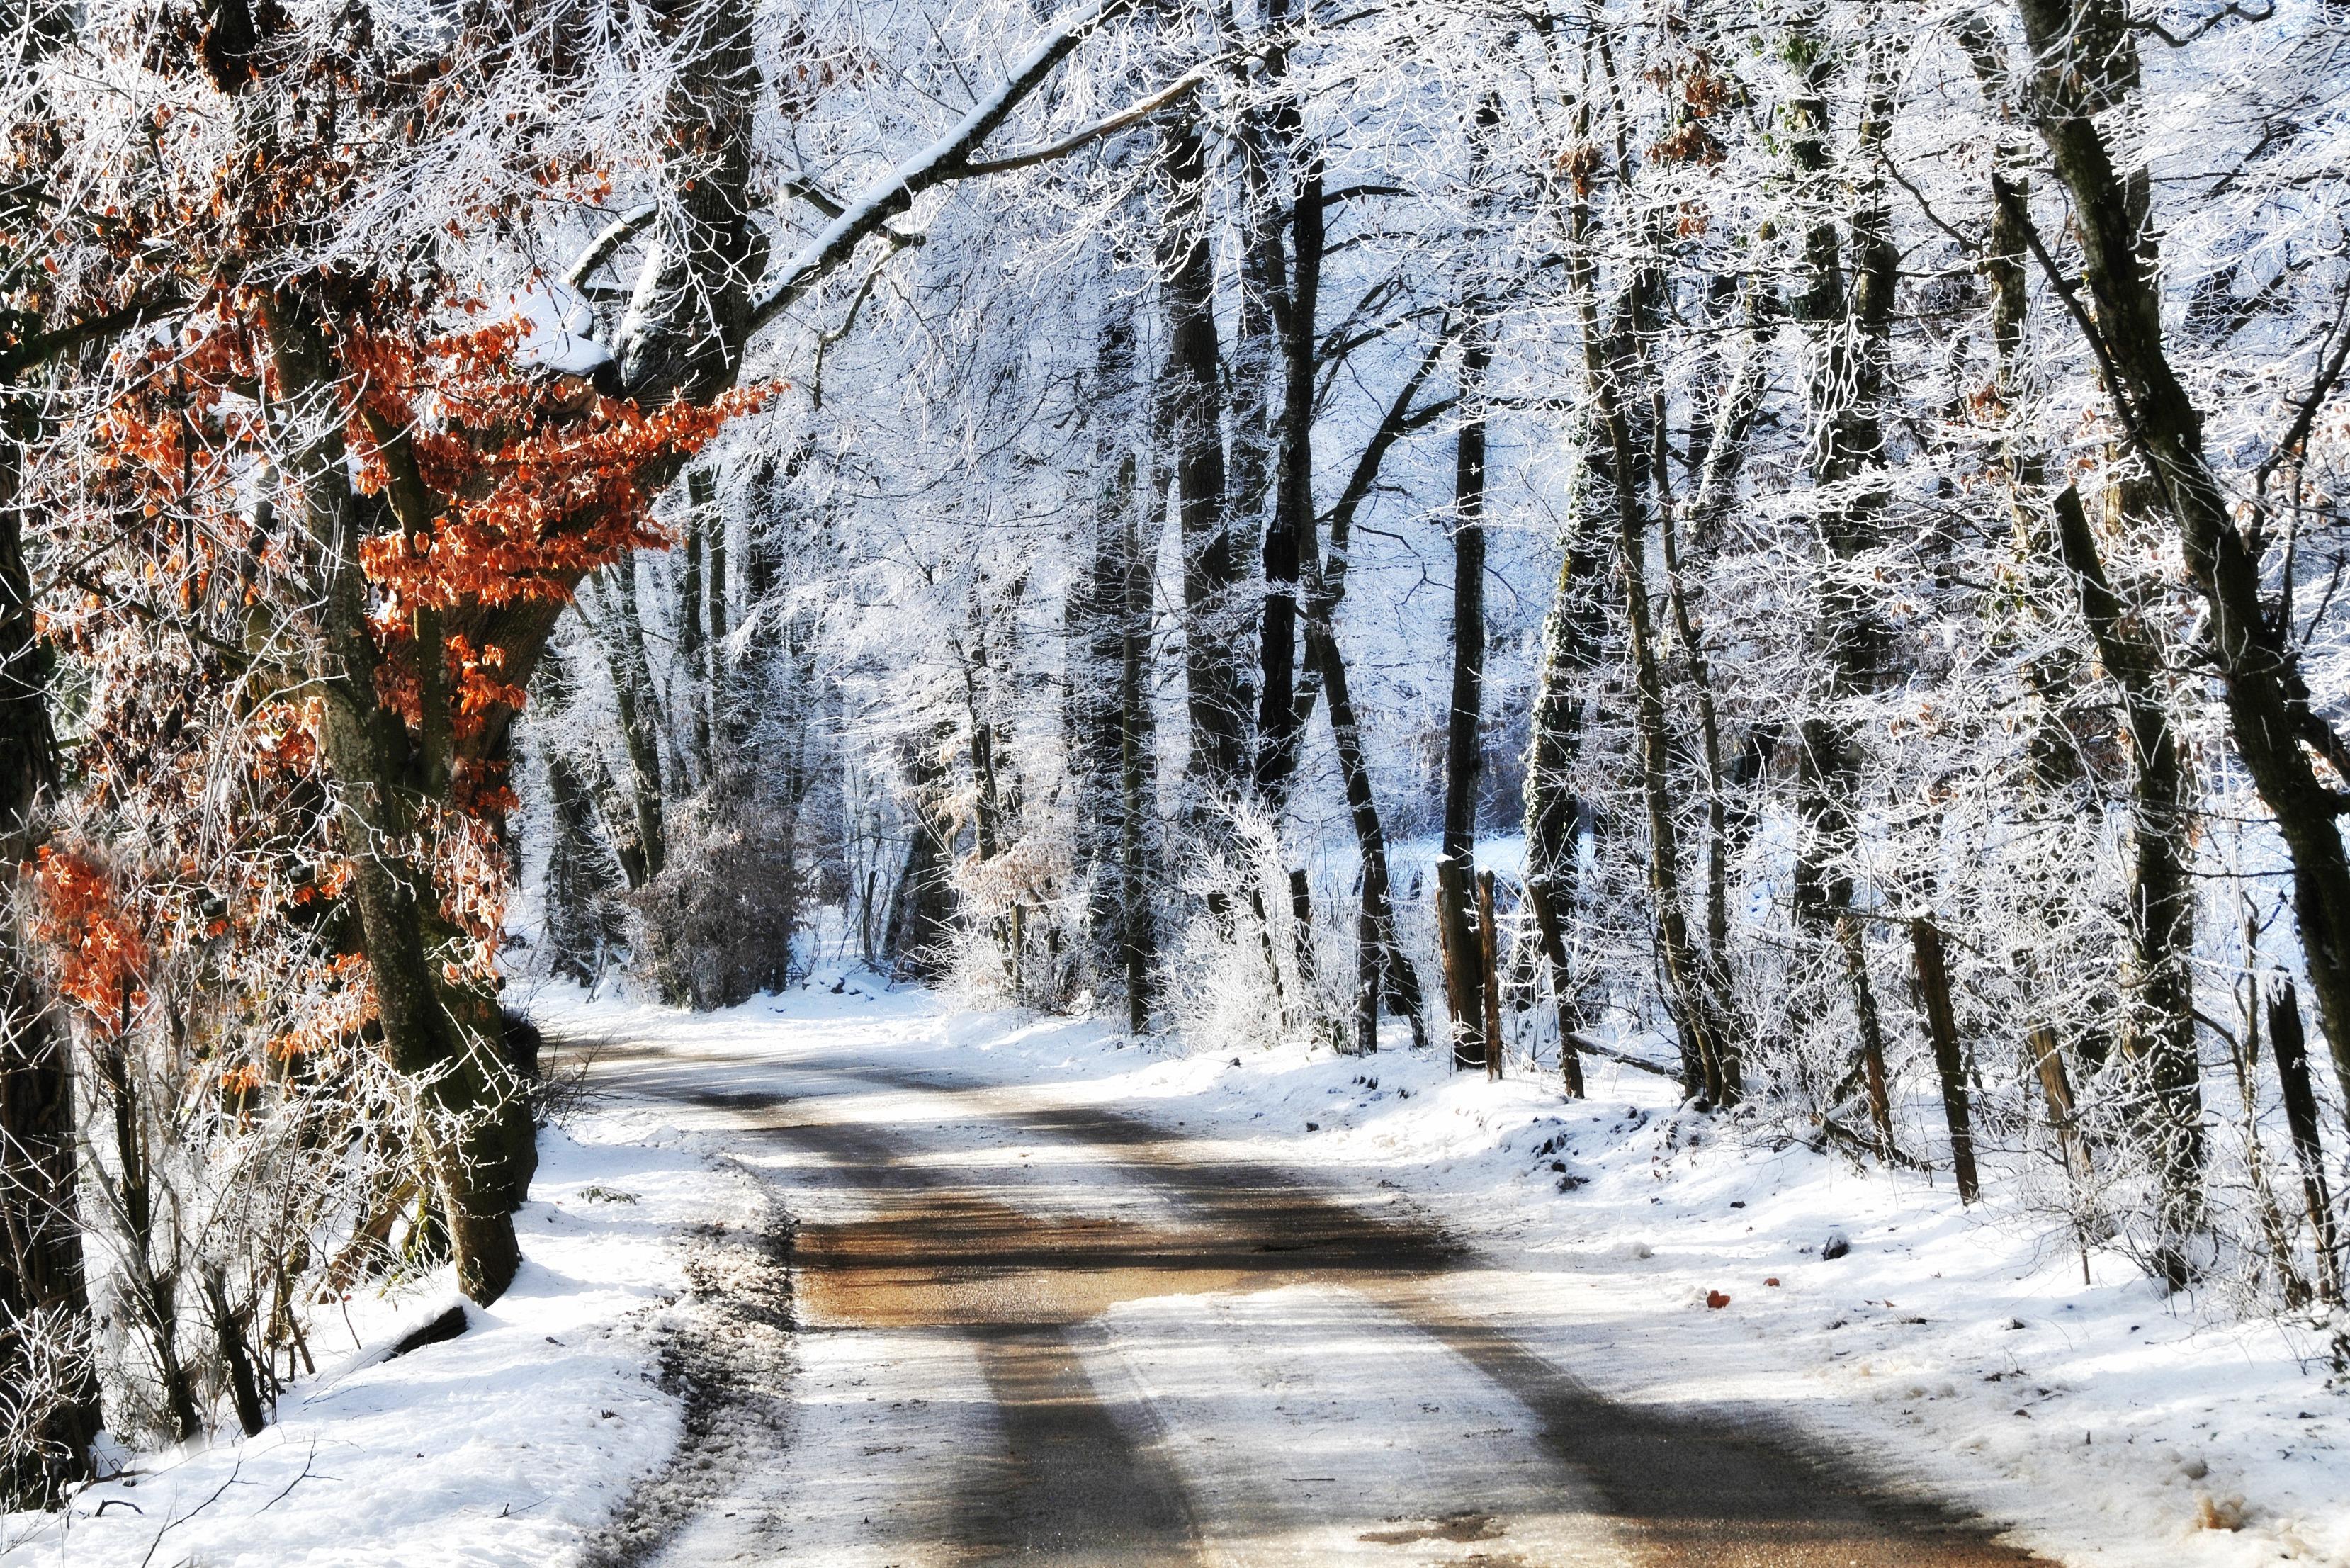 Пейзаж север зима фото оттенок